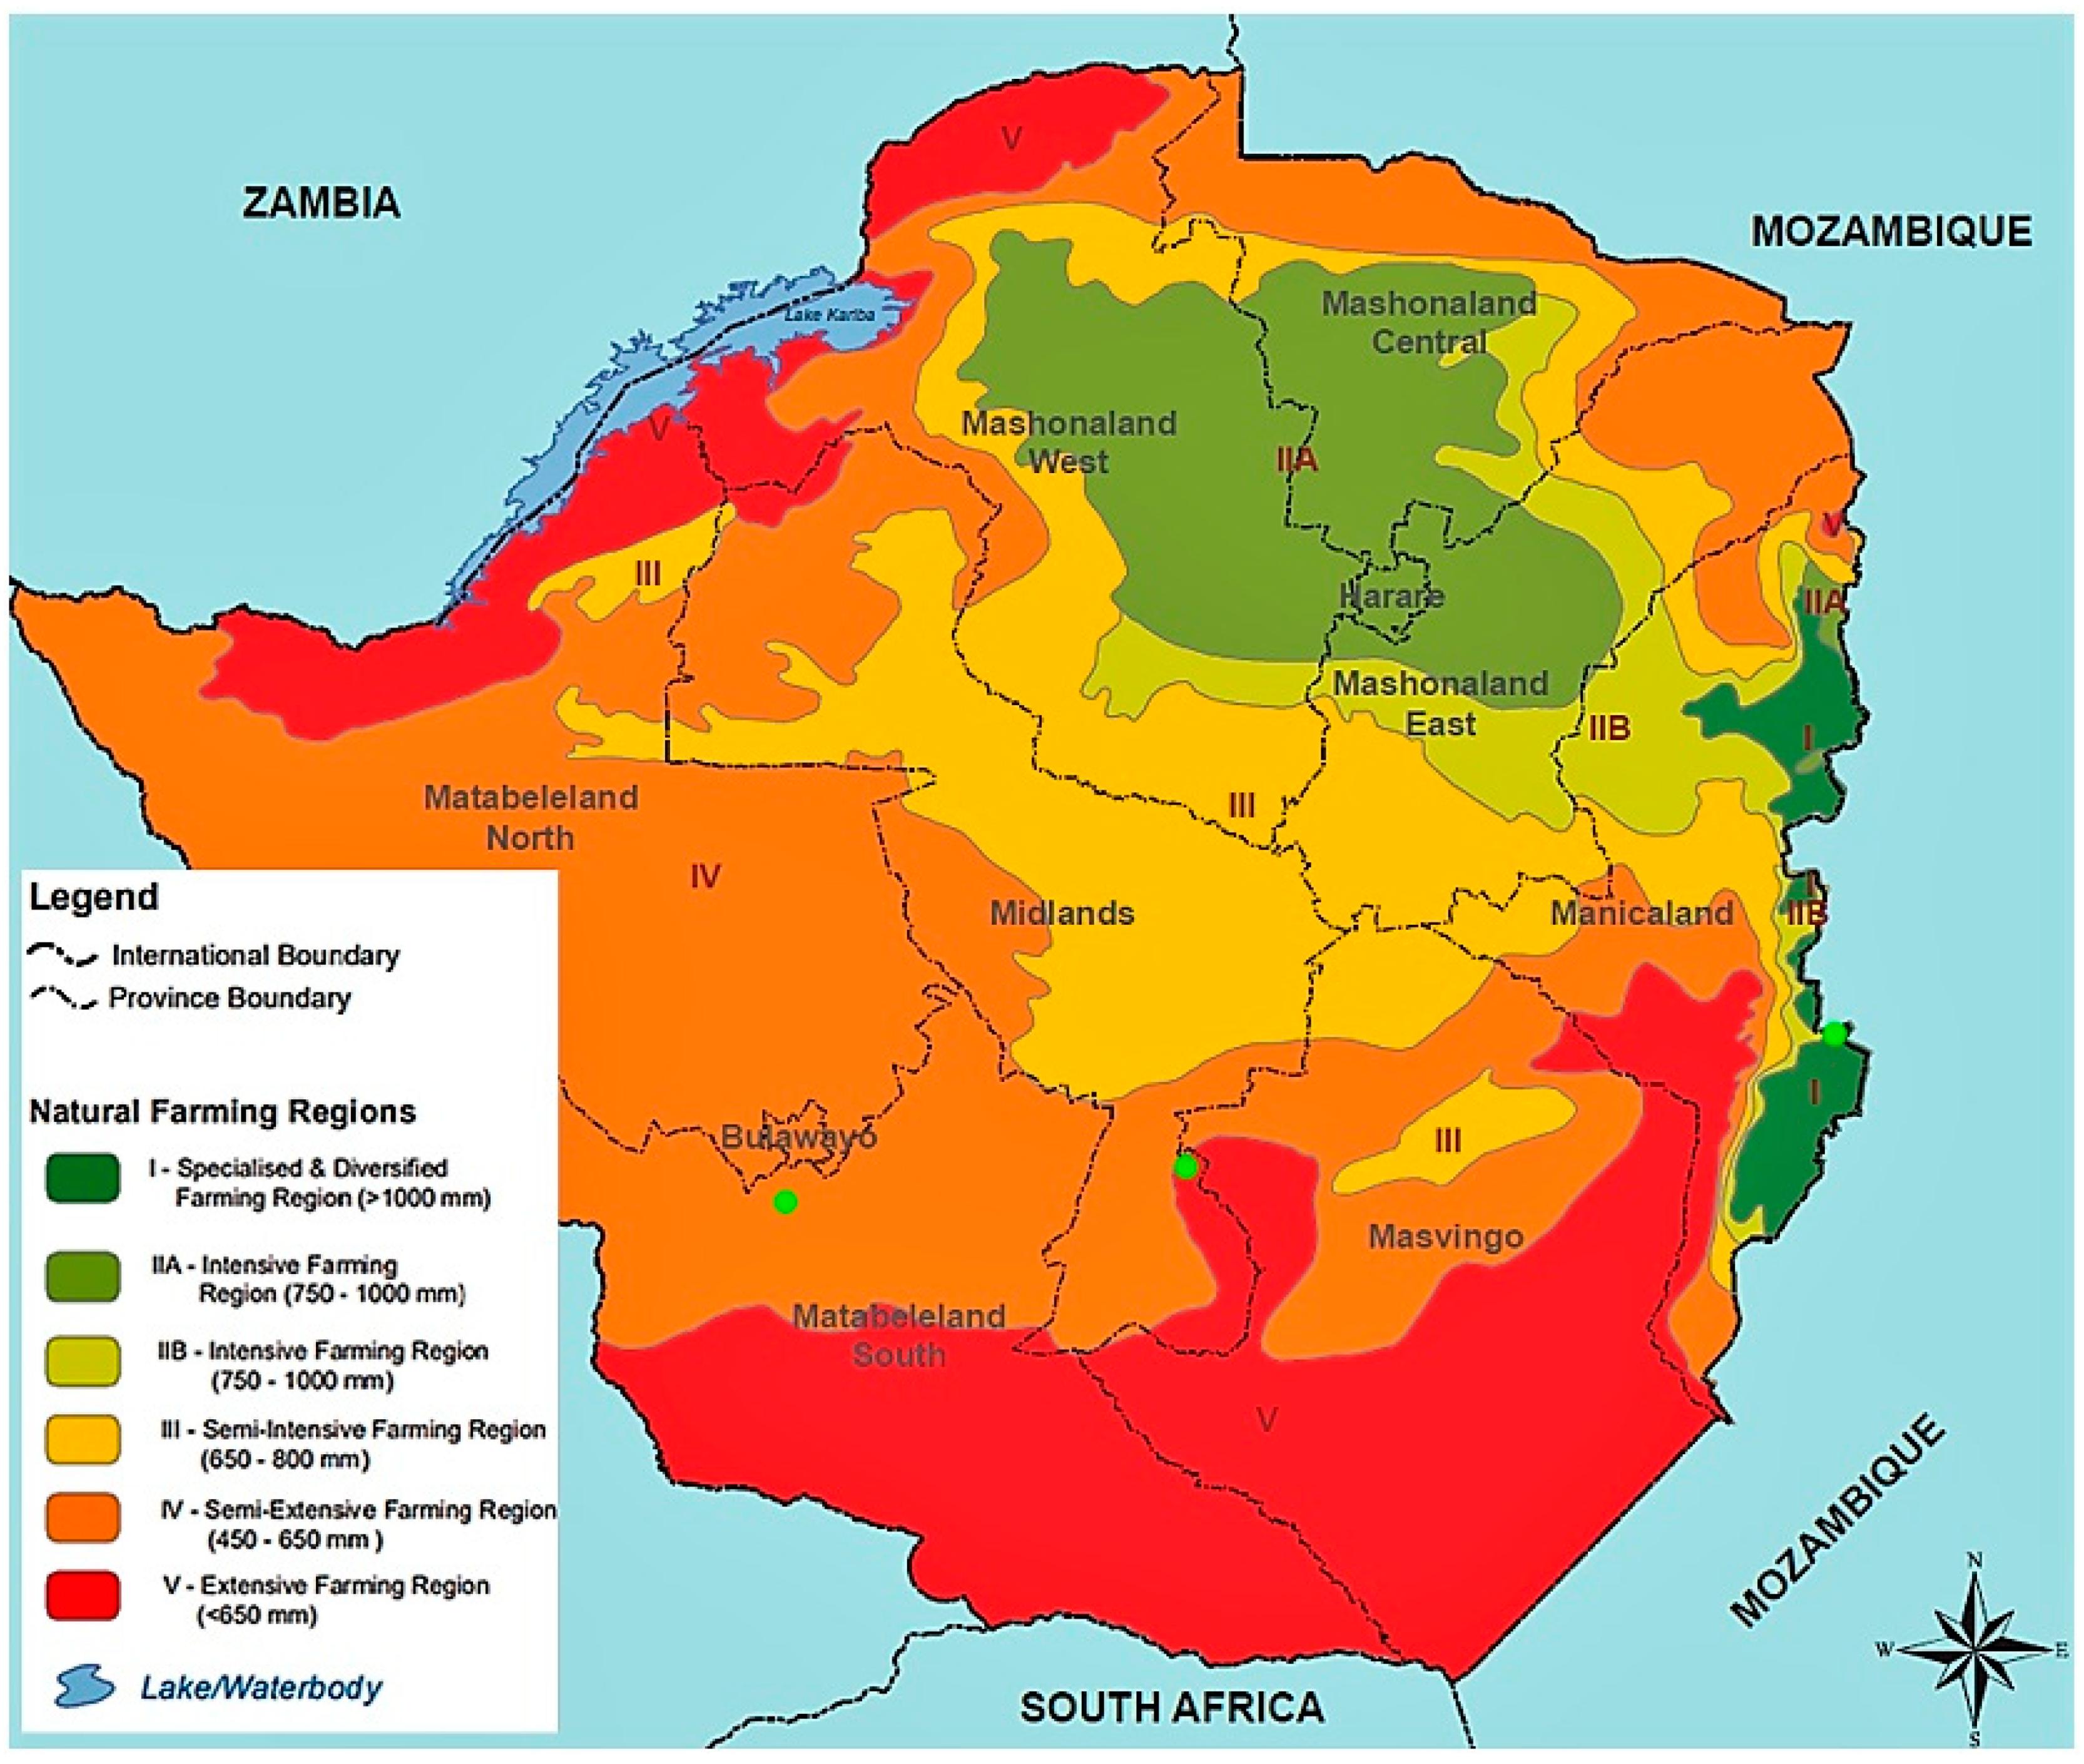 Zimbabwe Map Of Regions on malaysia regions map, finland regions map, afghanistan regions map, moldova regions map, nicaragua regions map, el salvador regions map, zimbabwe resources, uk regions map, cameroon regions map, united states of america regions map, africa regions map, hungary regions map, bahrain regions map, uganda regions map, mozambique regions map, armenia regions map, latvia regions map, venezuela regions map, guinea regions map, central african republic regions map,